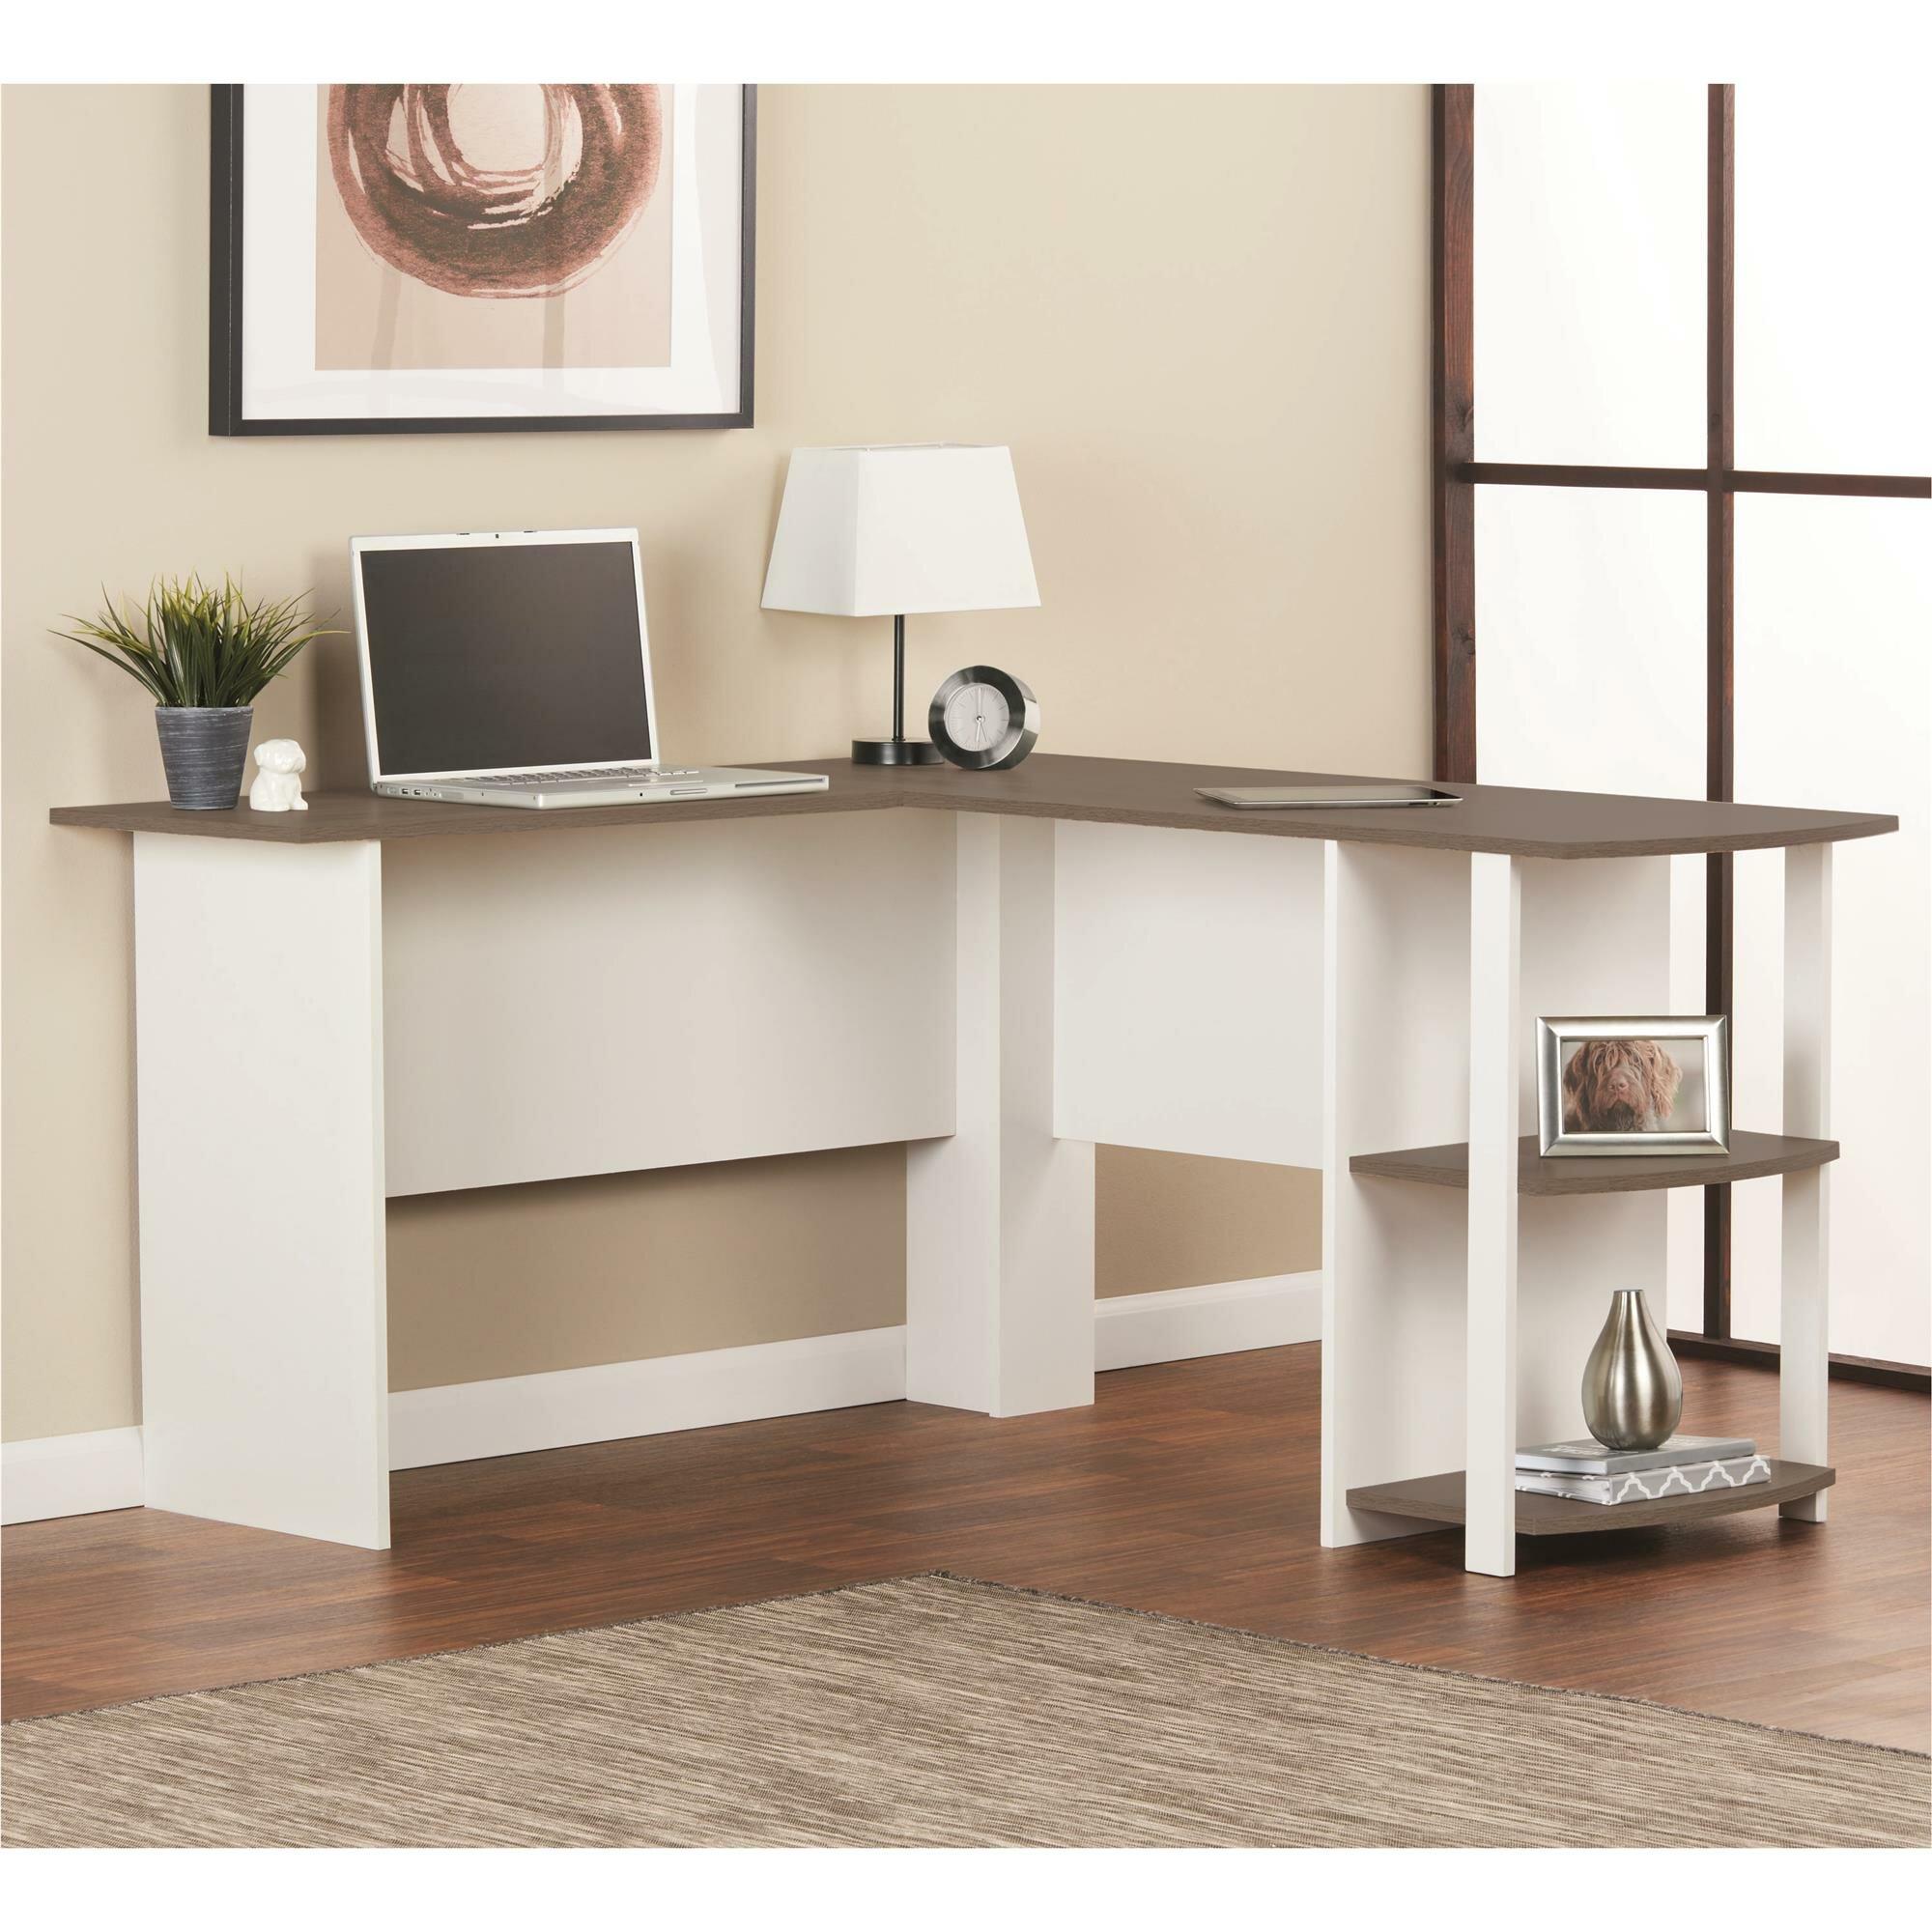 Medium Wood White L Shaped Desks You Ll Love In 2021 Wayfair